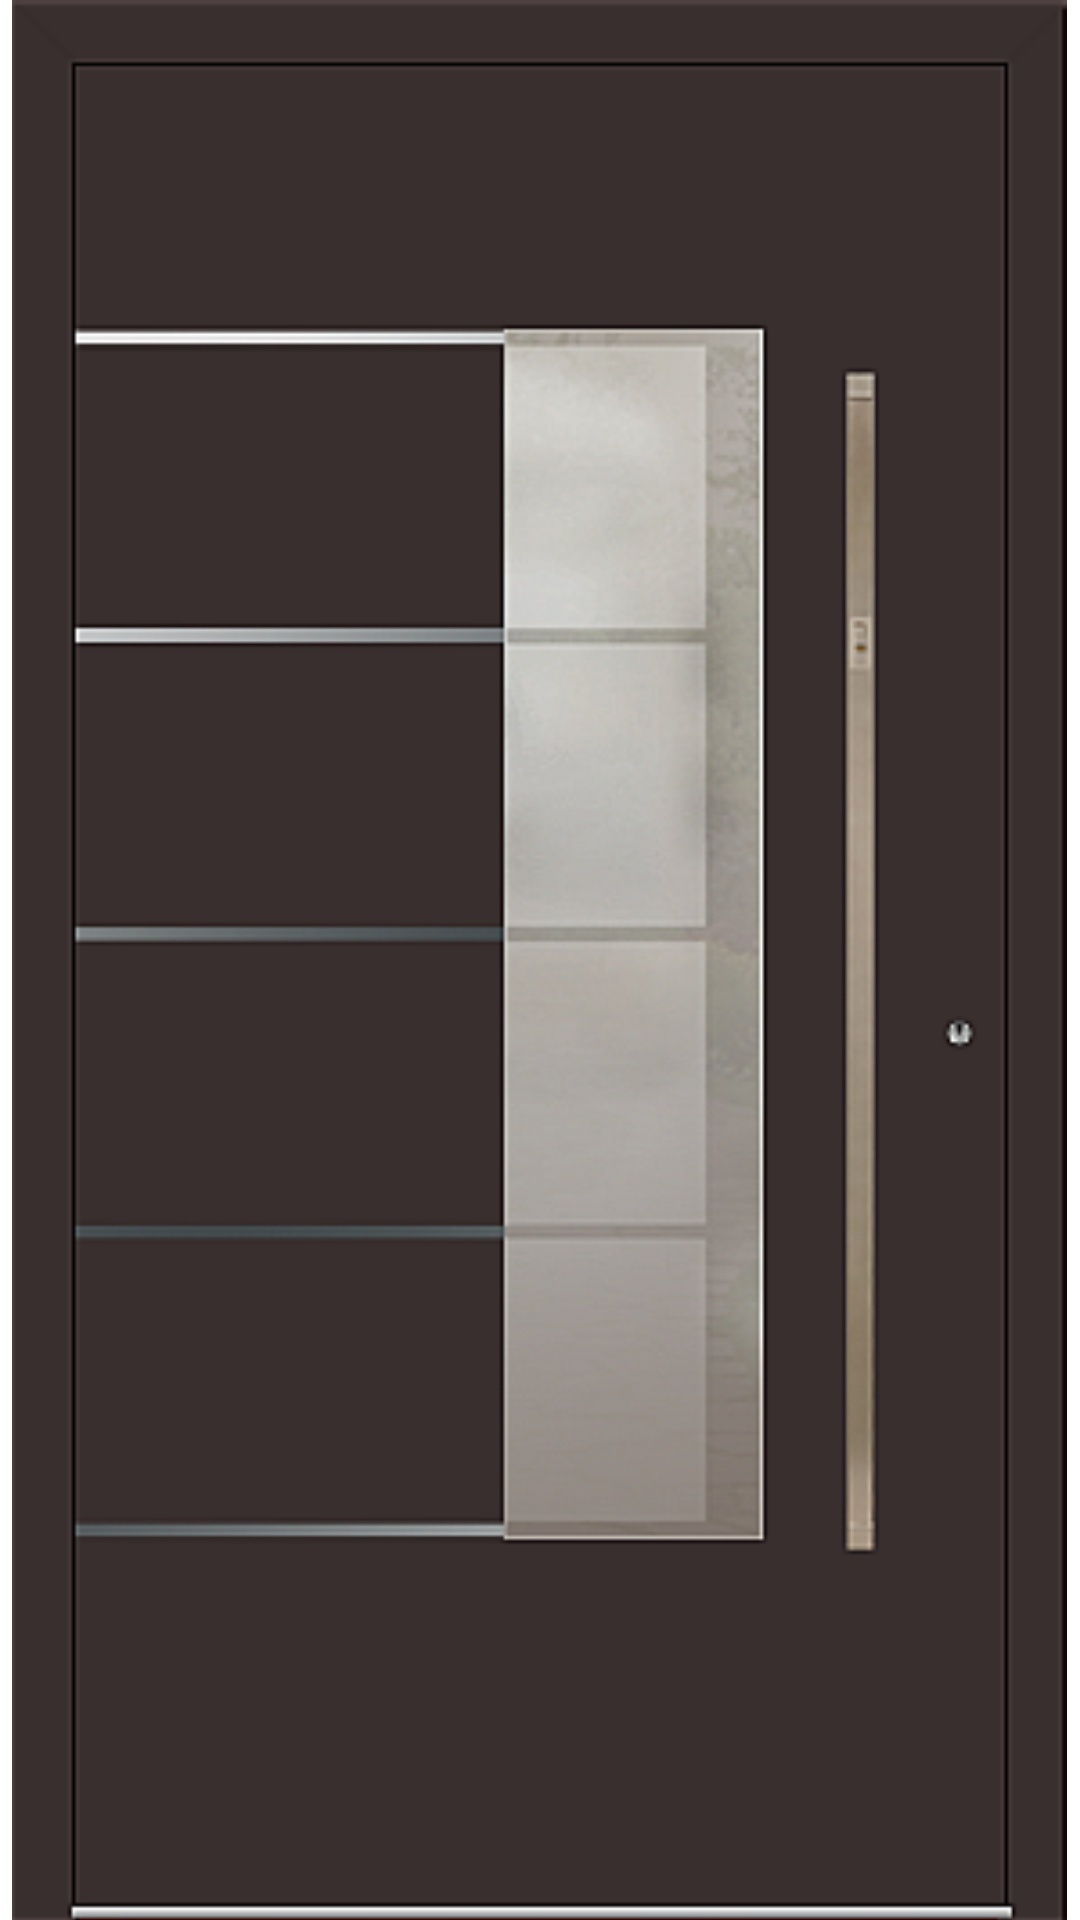 PaXentree Aluminium Haustür M02551 schokoladenbraun